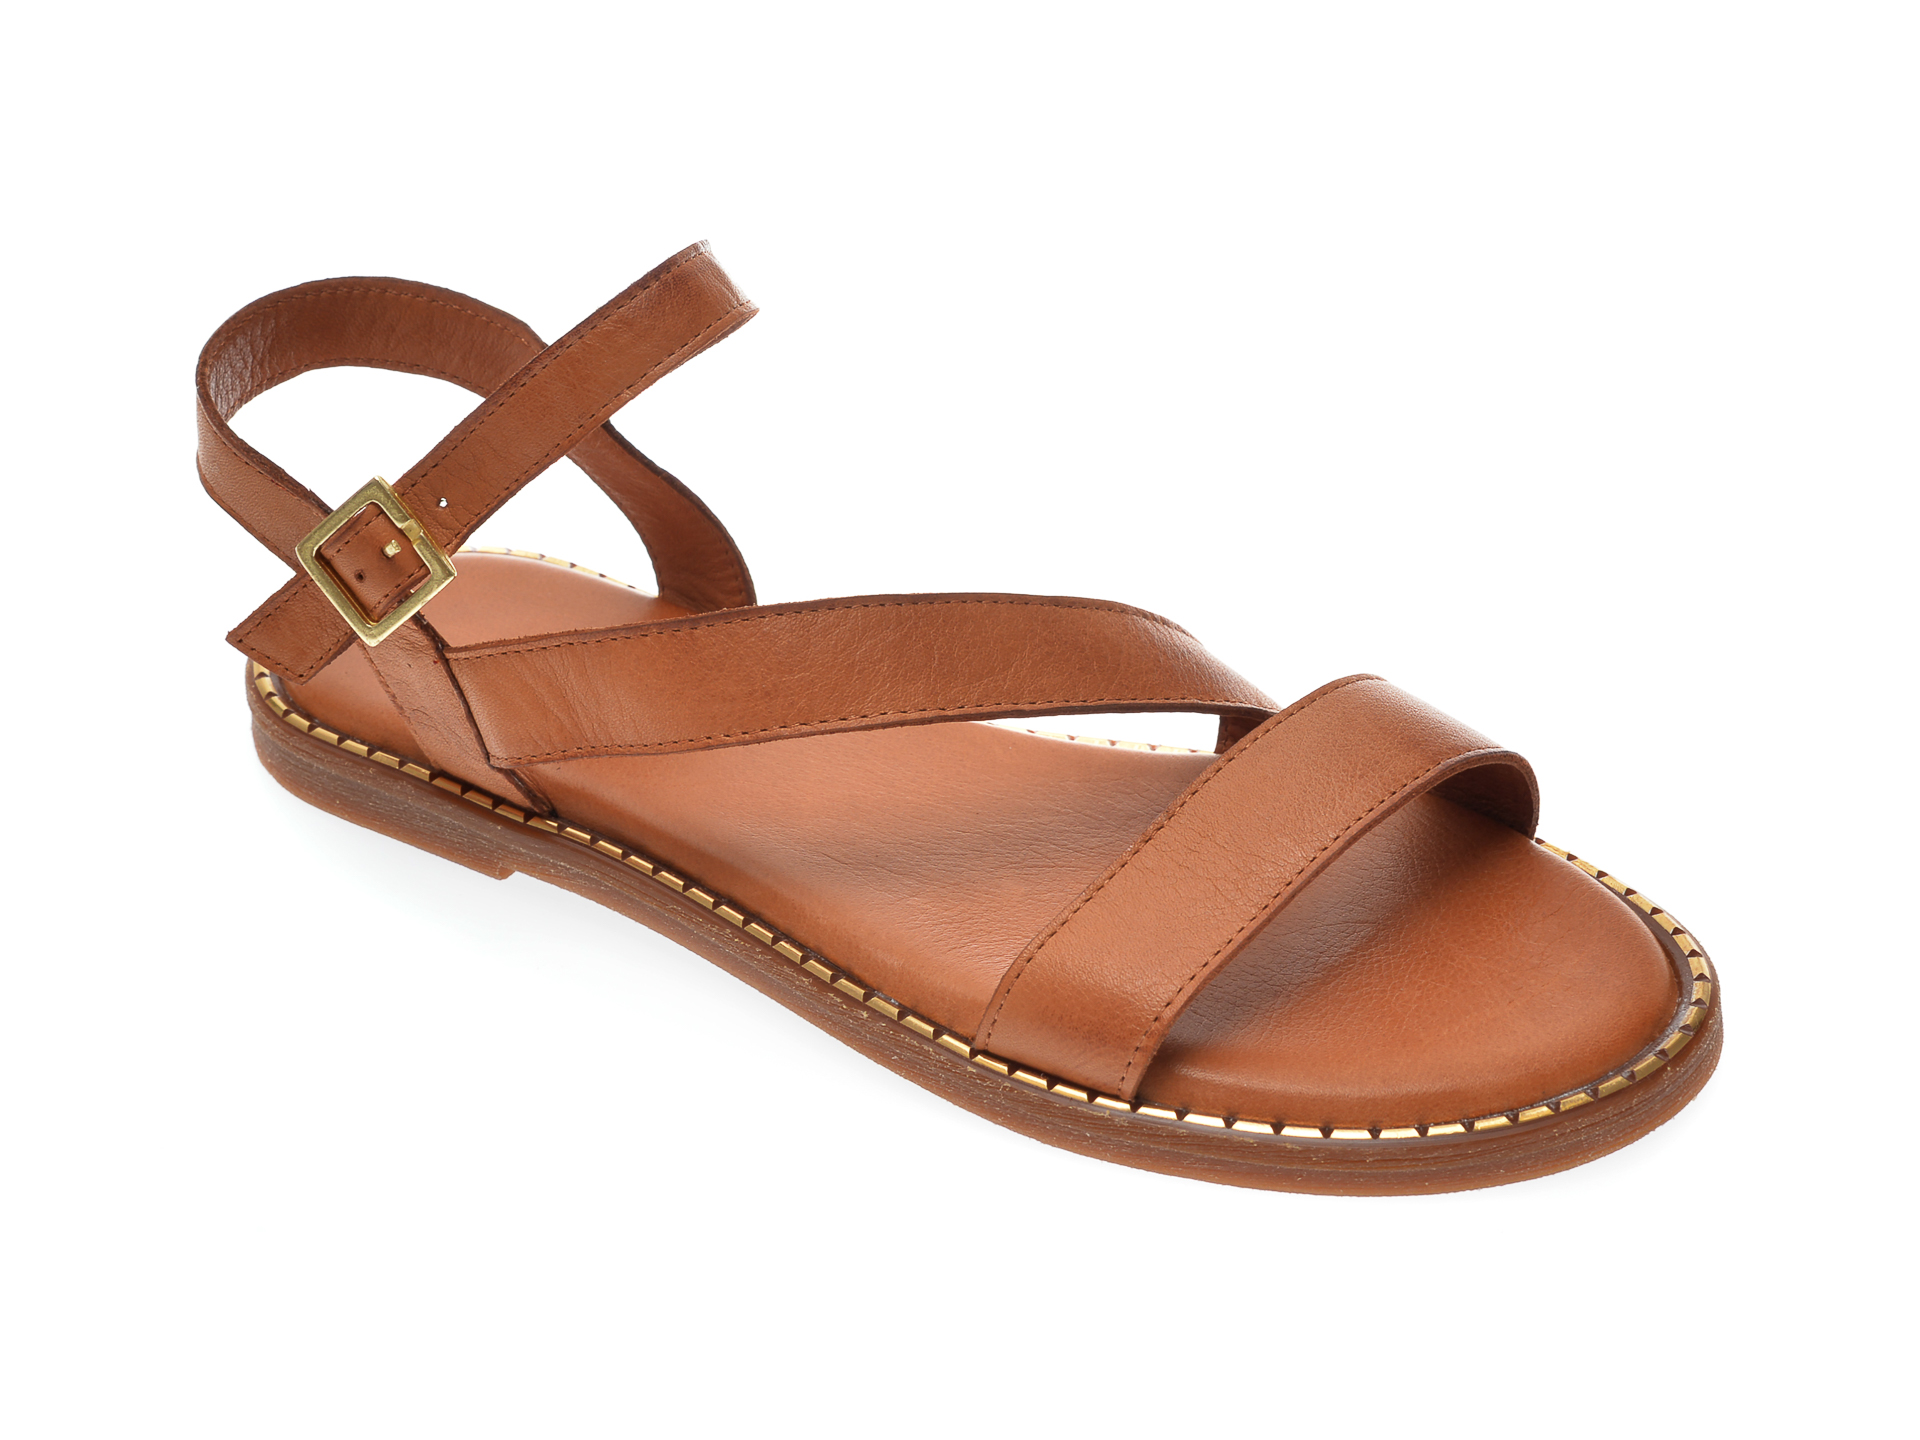 Sandale IMAGE maro, 711, din piele naturala imagine otter.ro 2021